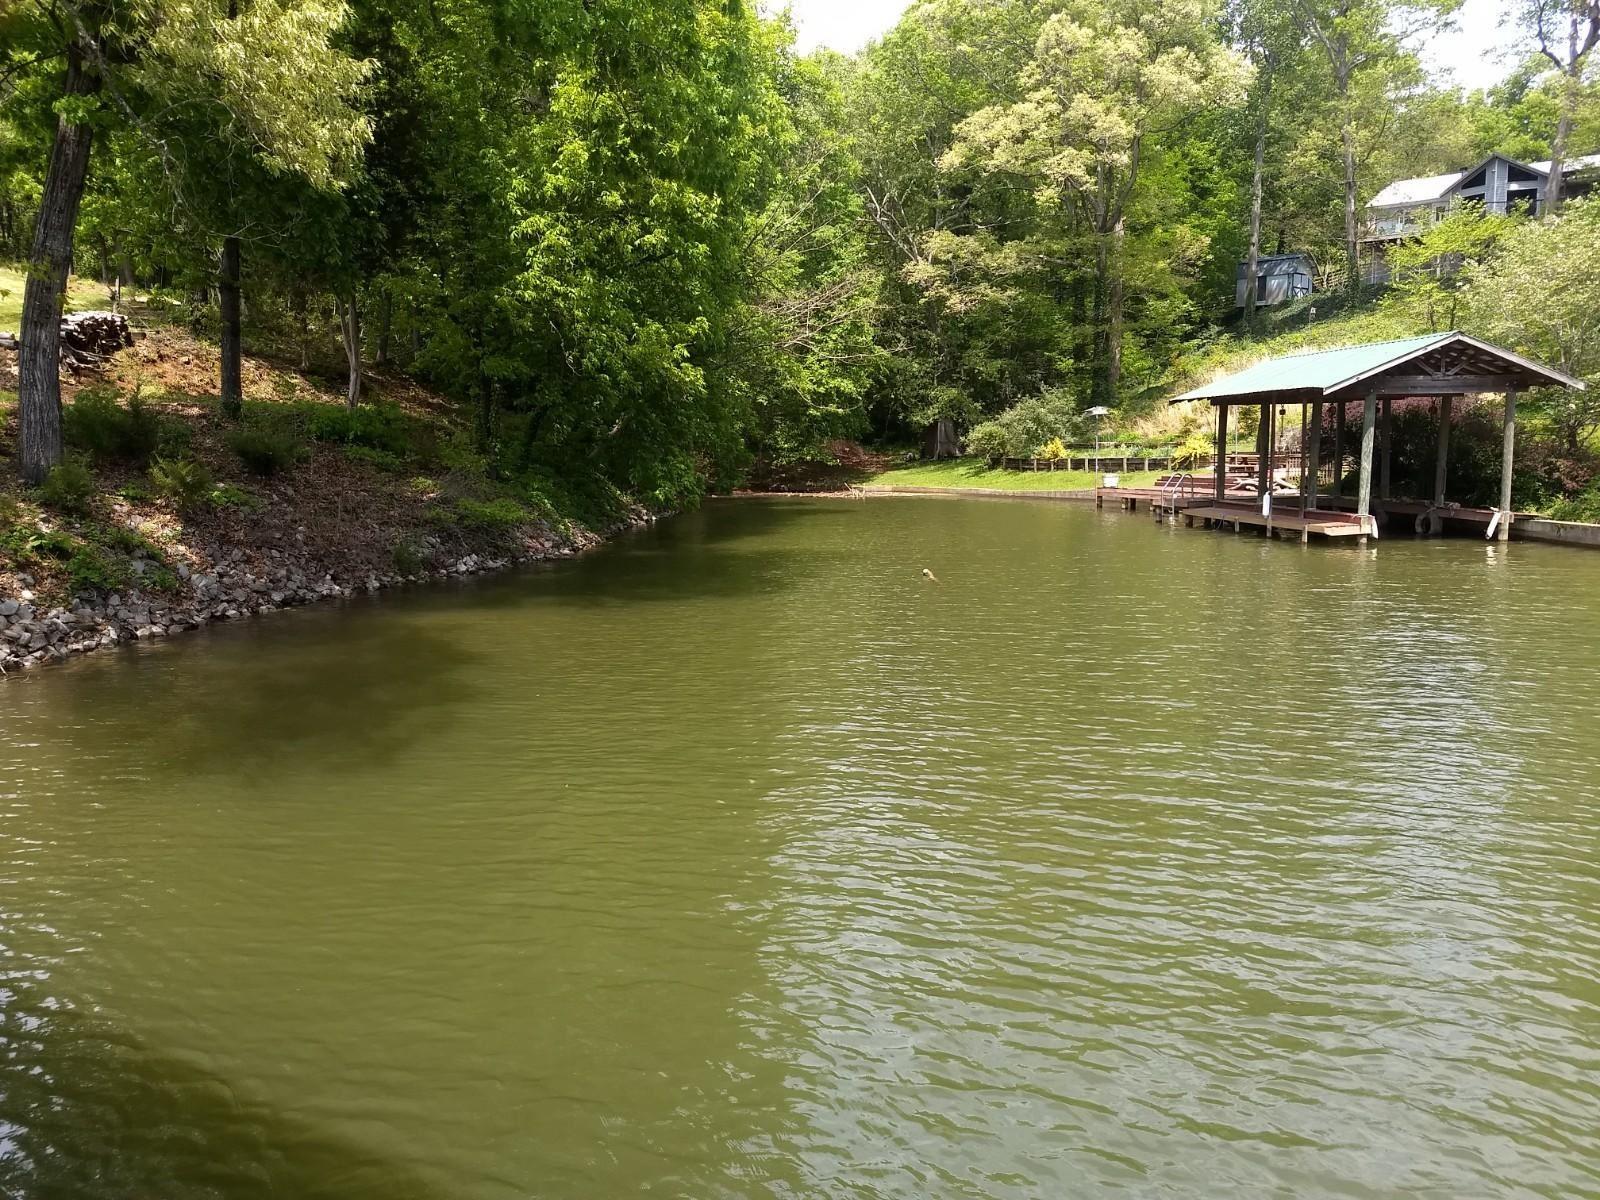 Photo for Lake Vista Dr Lot 71R & 70, Friendsville, TN 37737 (MLS # 1150965)